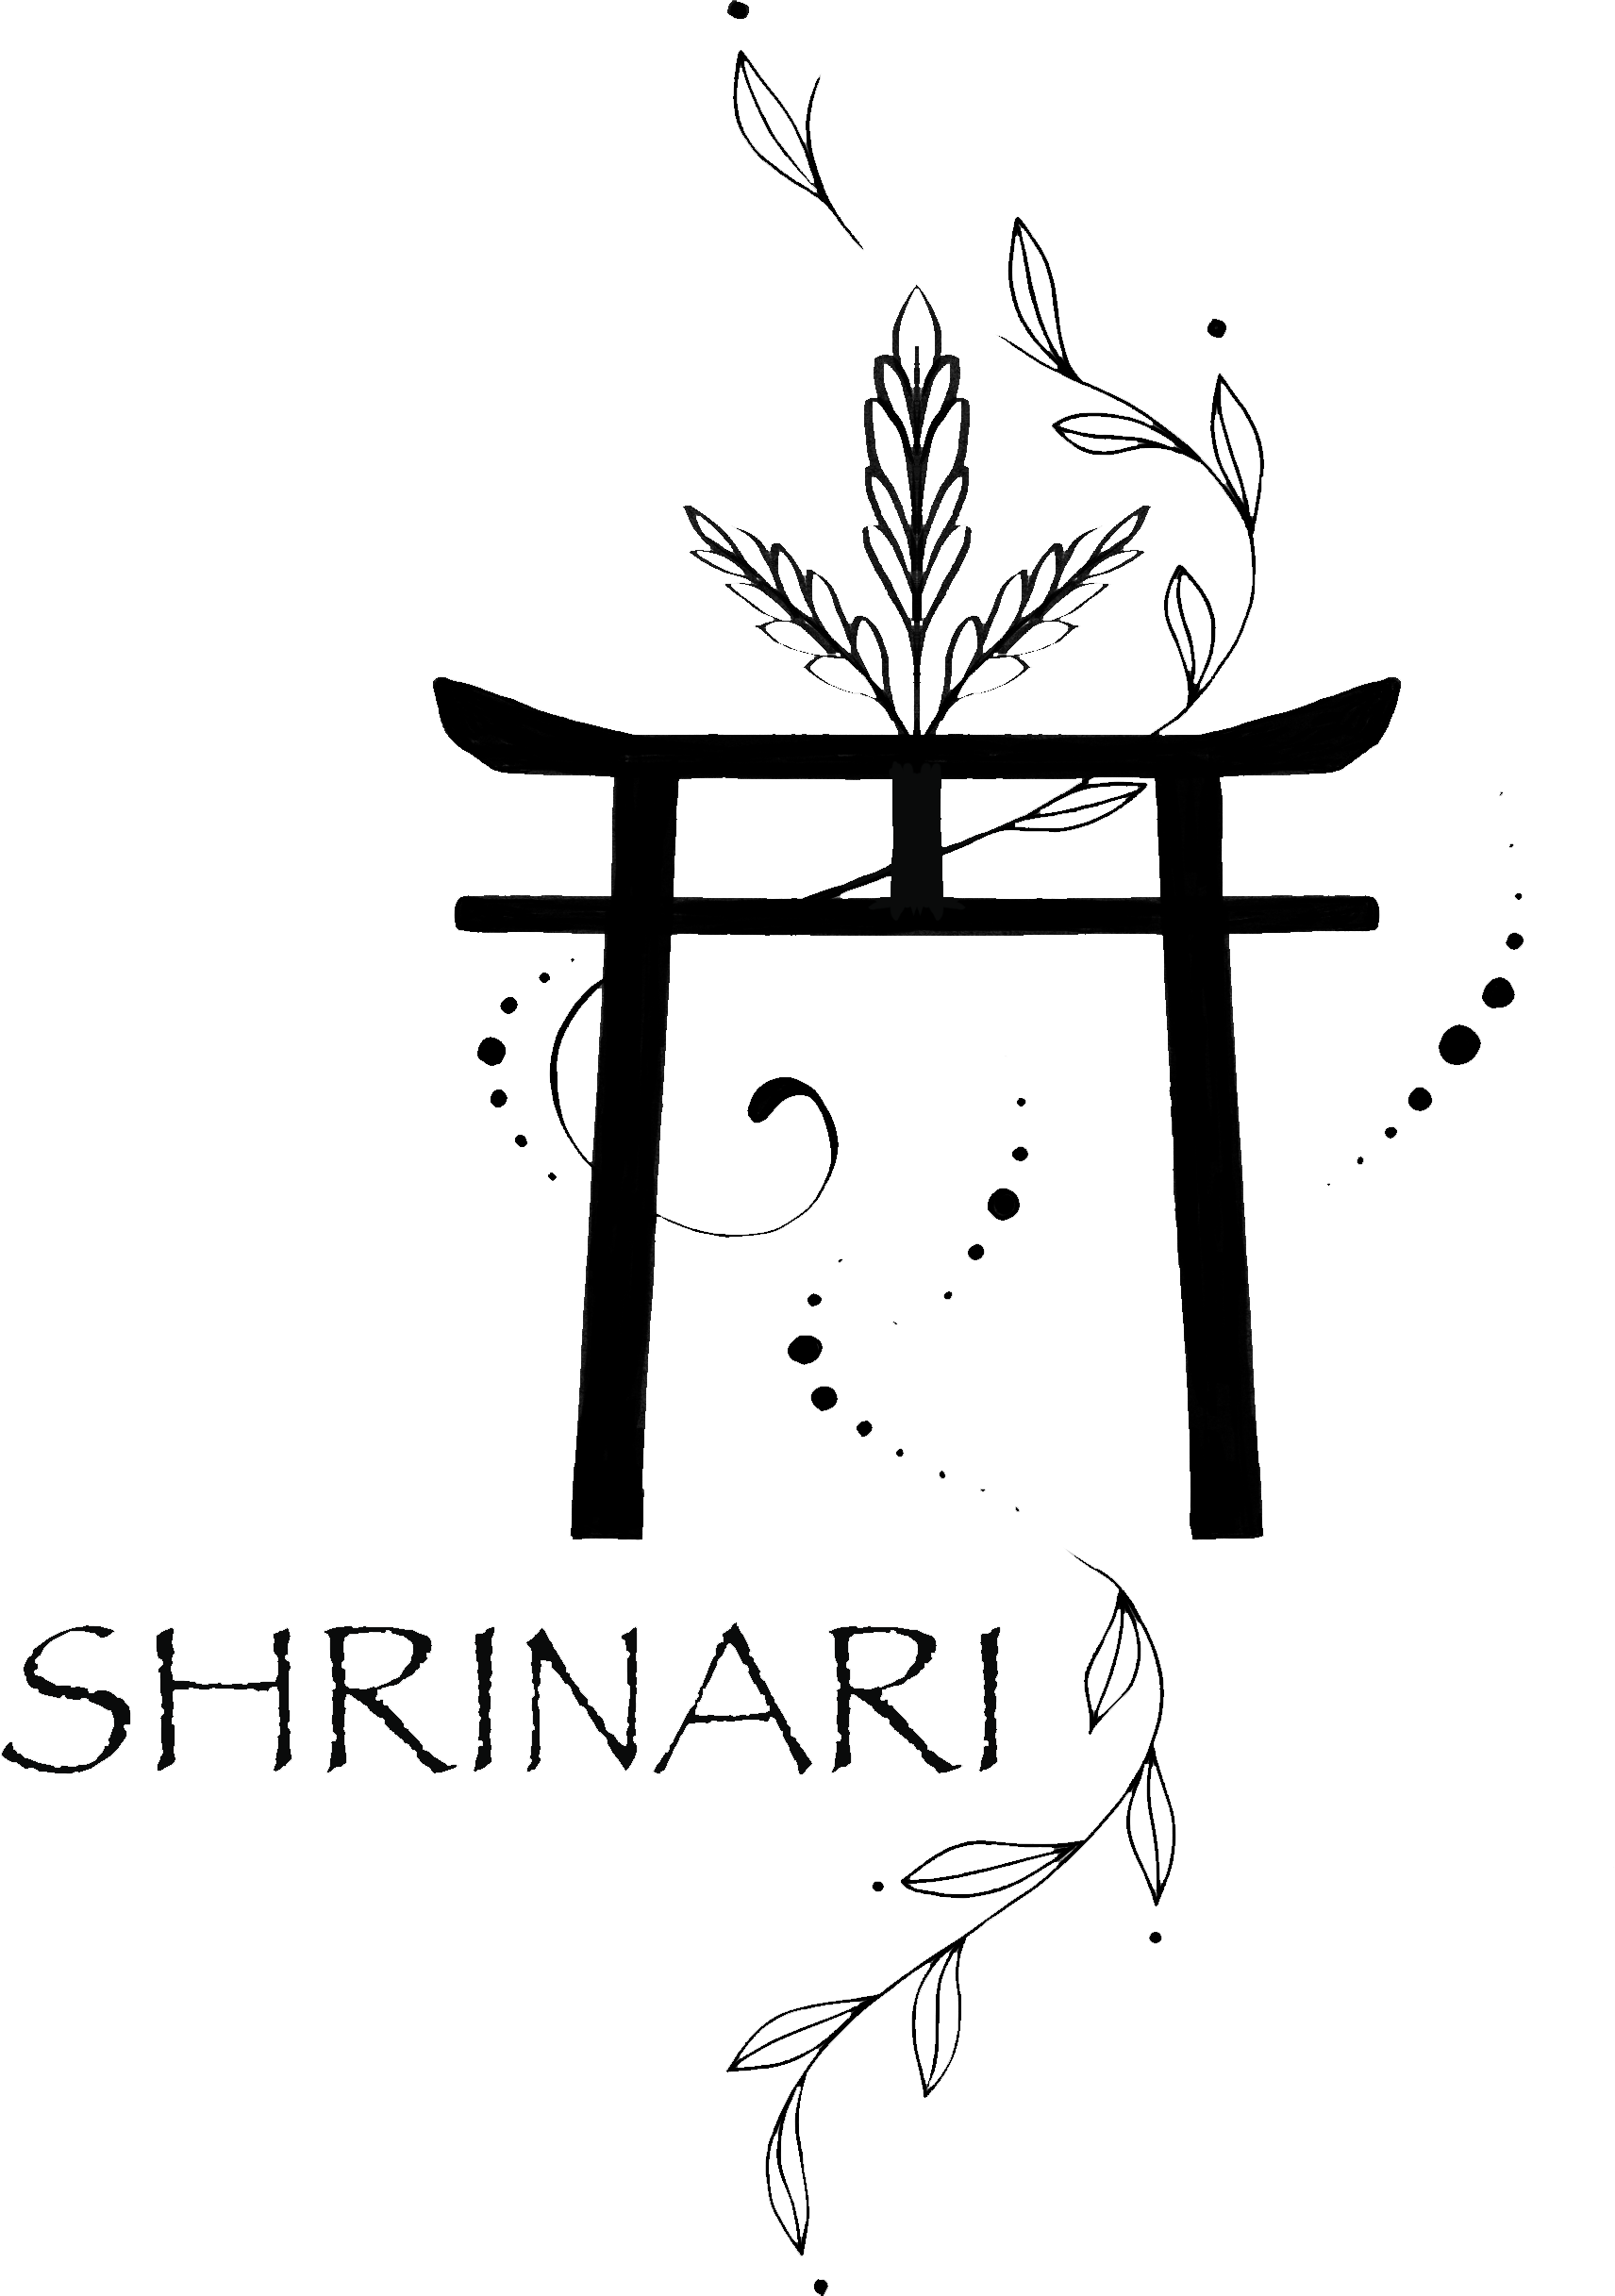 Shrinari